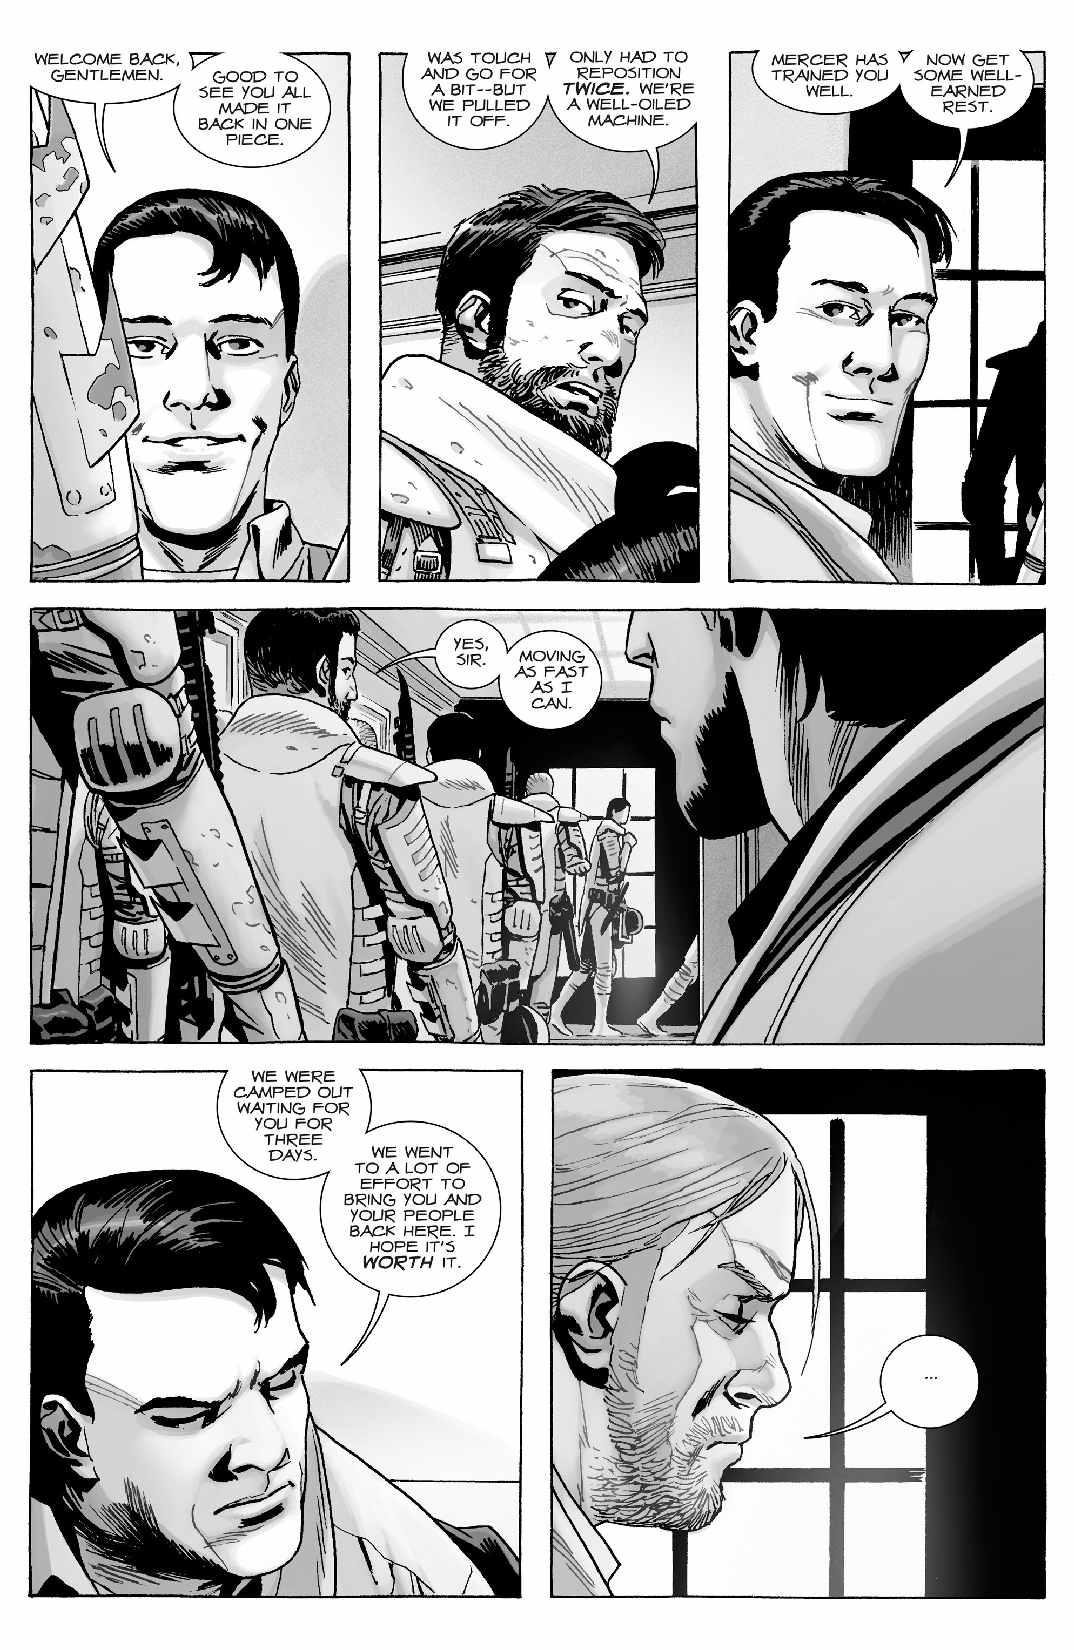 Read Comics Online Free - The Walking Dead - Chapter 176